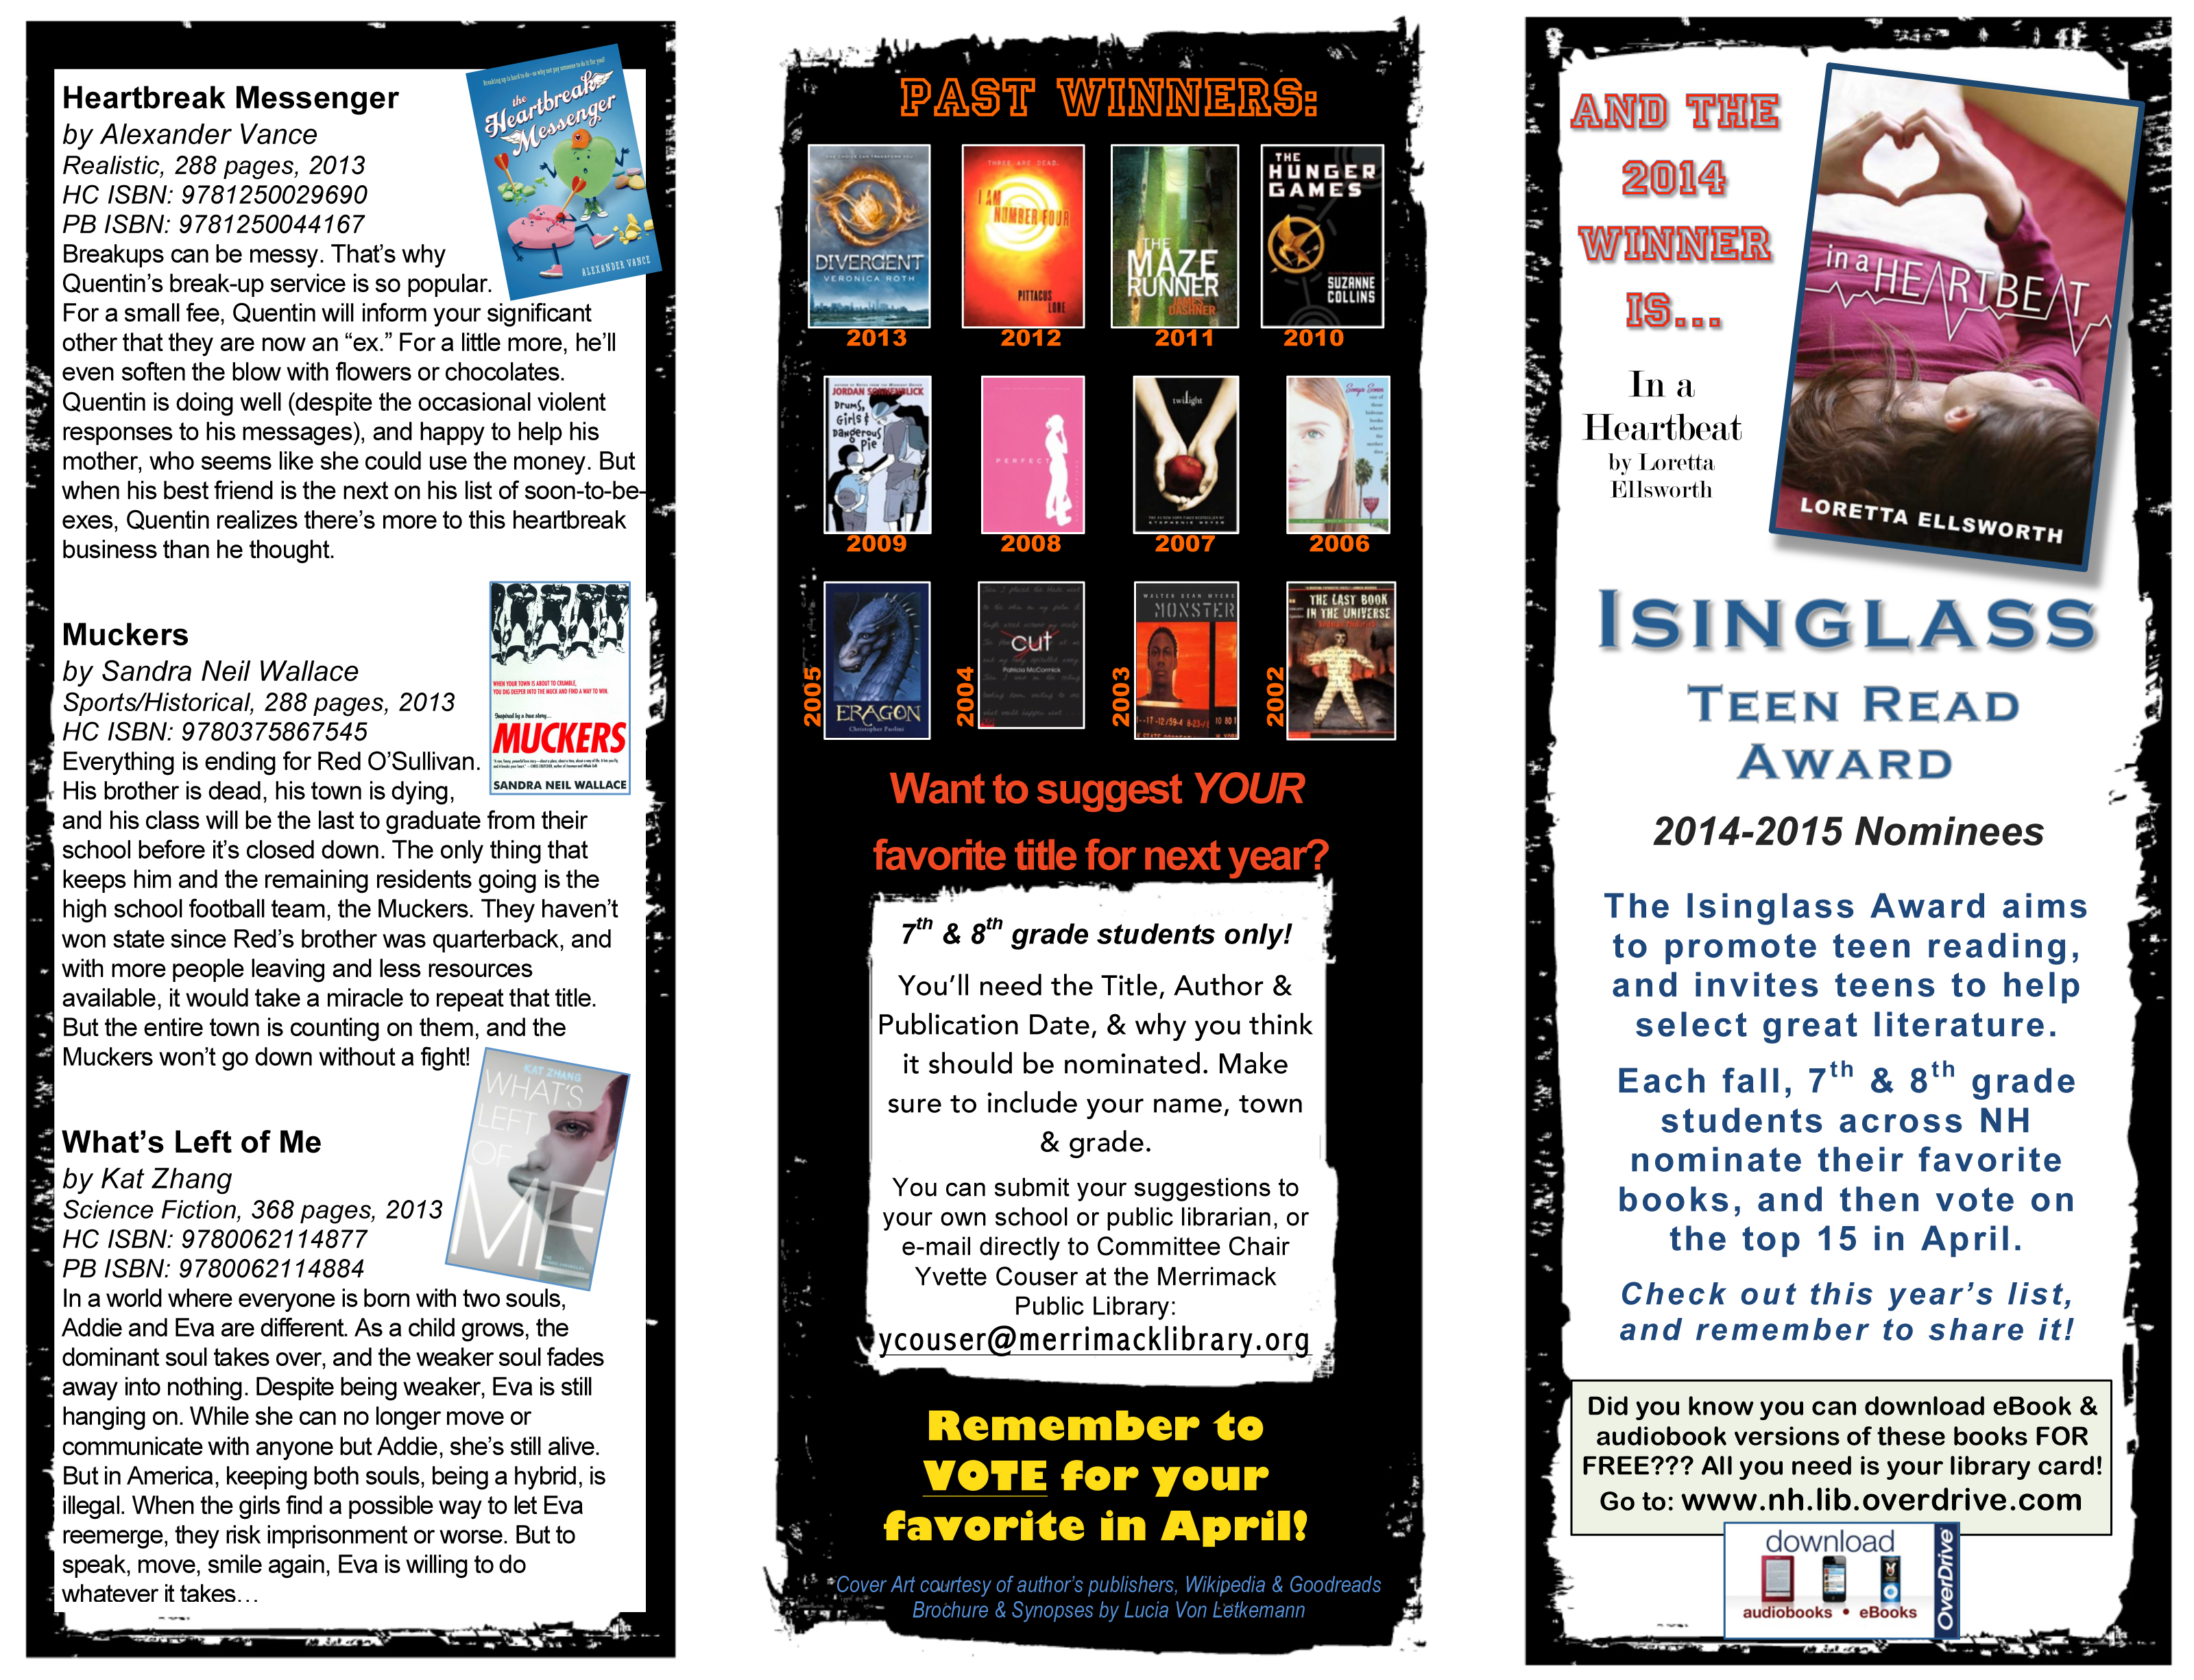 Isinglass Brochure 2014-15